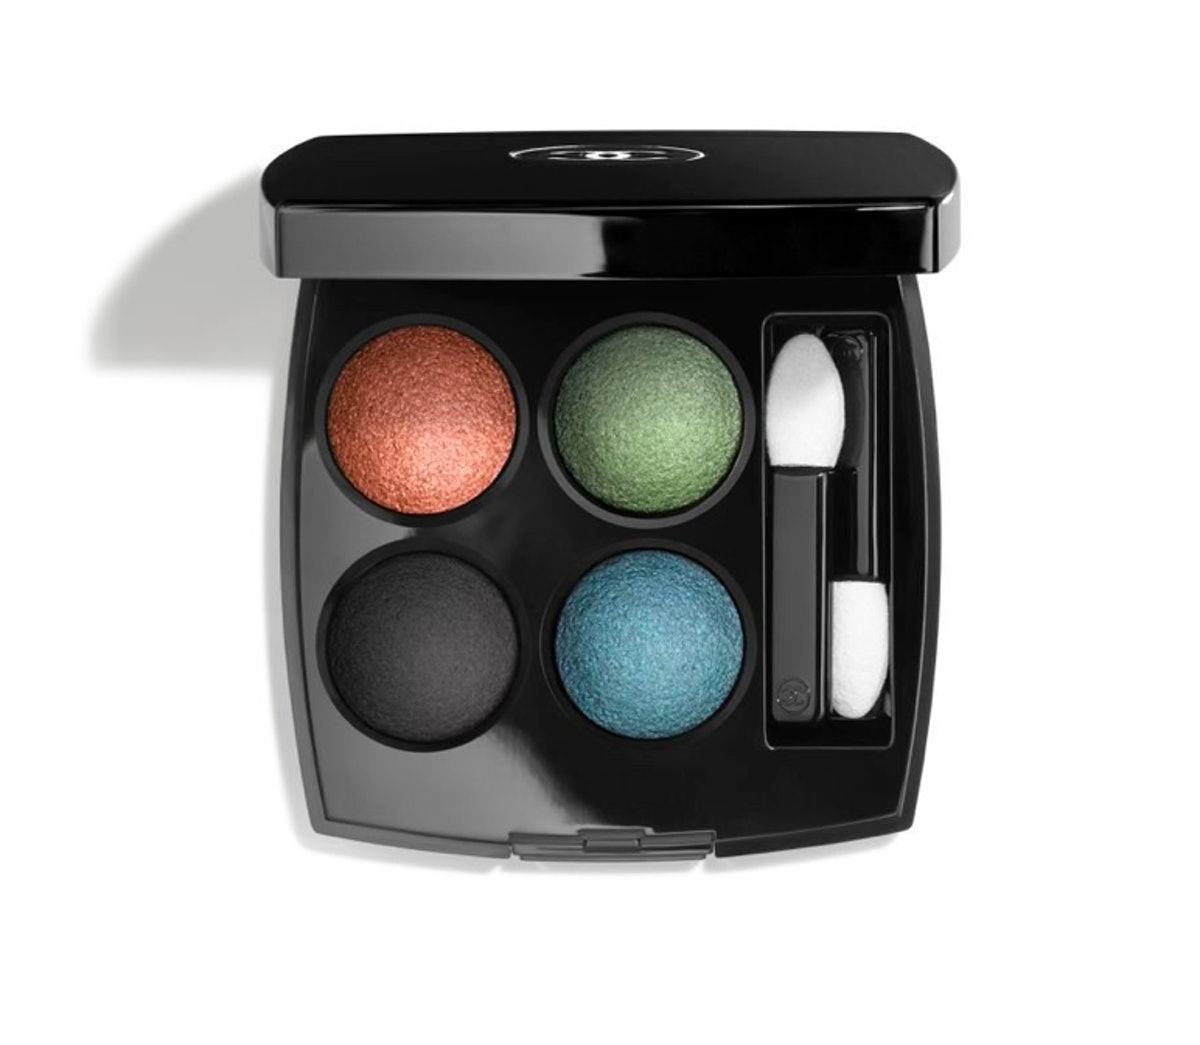 "Les 4 Ombres Multi-Effect Quadra Eyeshadow in ""306 Spendeur et Audace"""